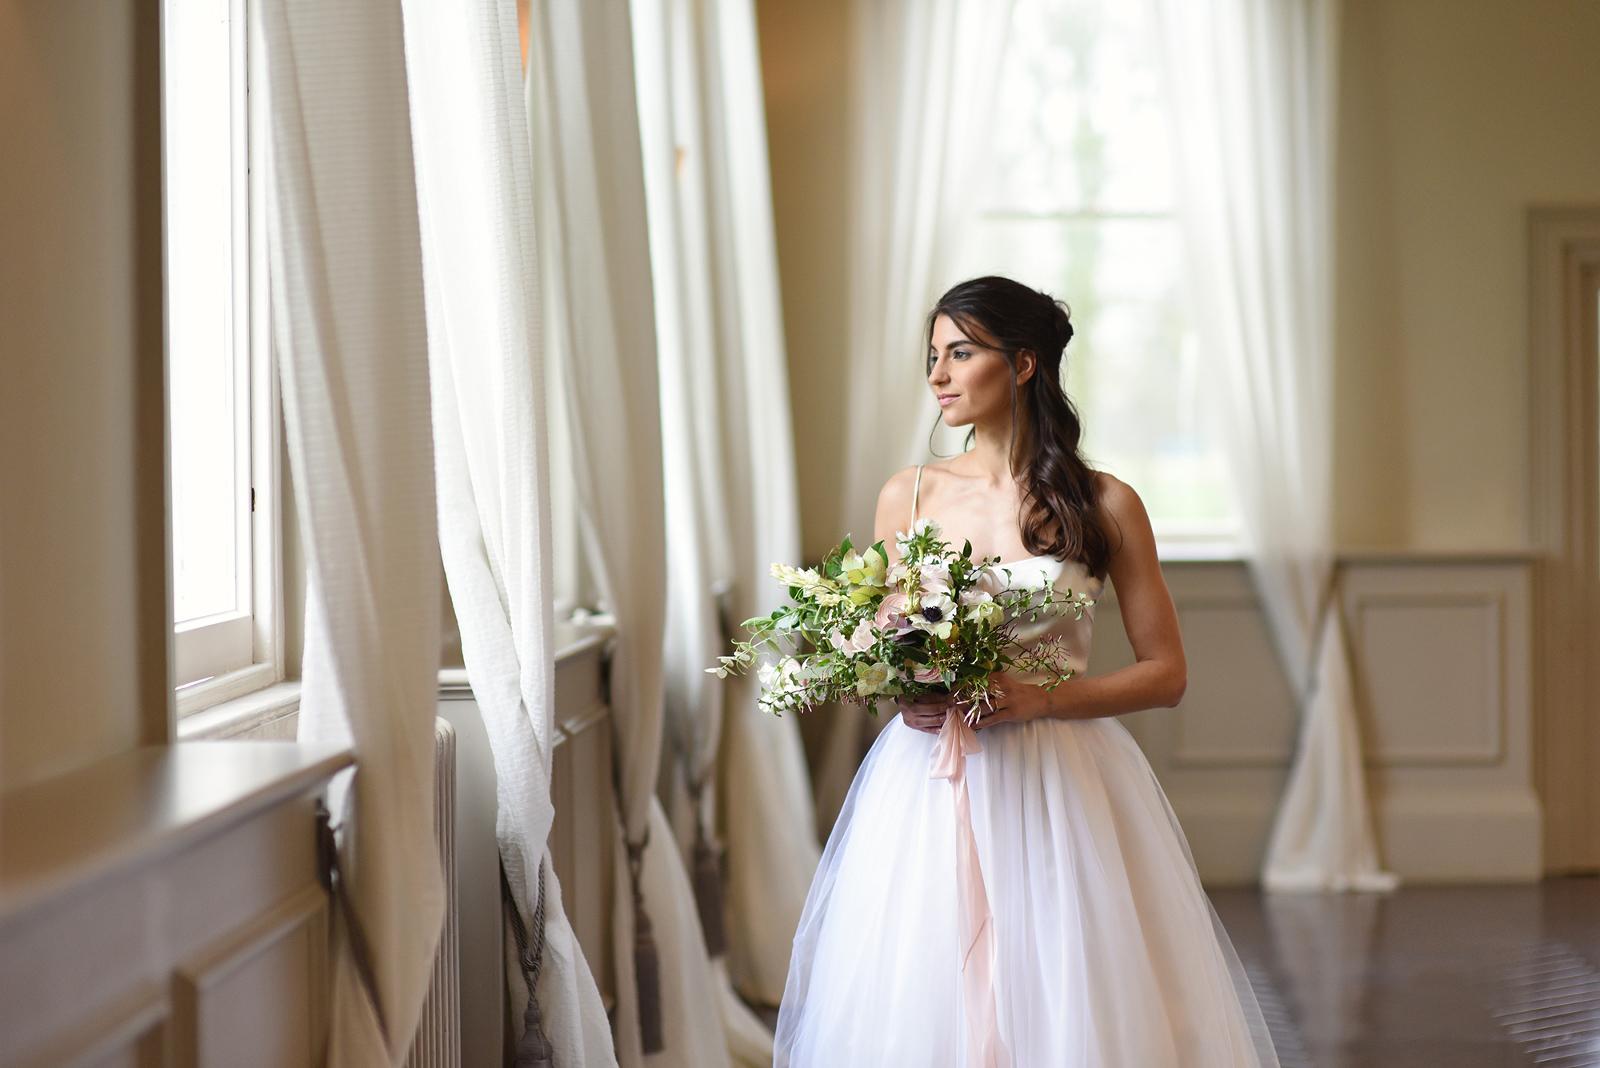 bridal portrait in Morden Hall London